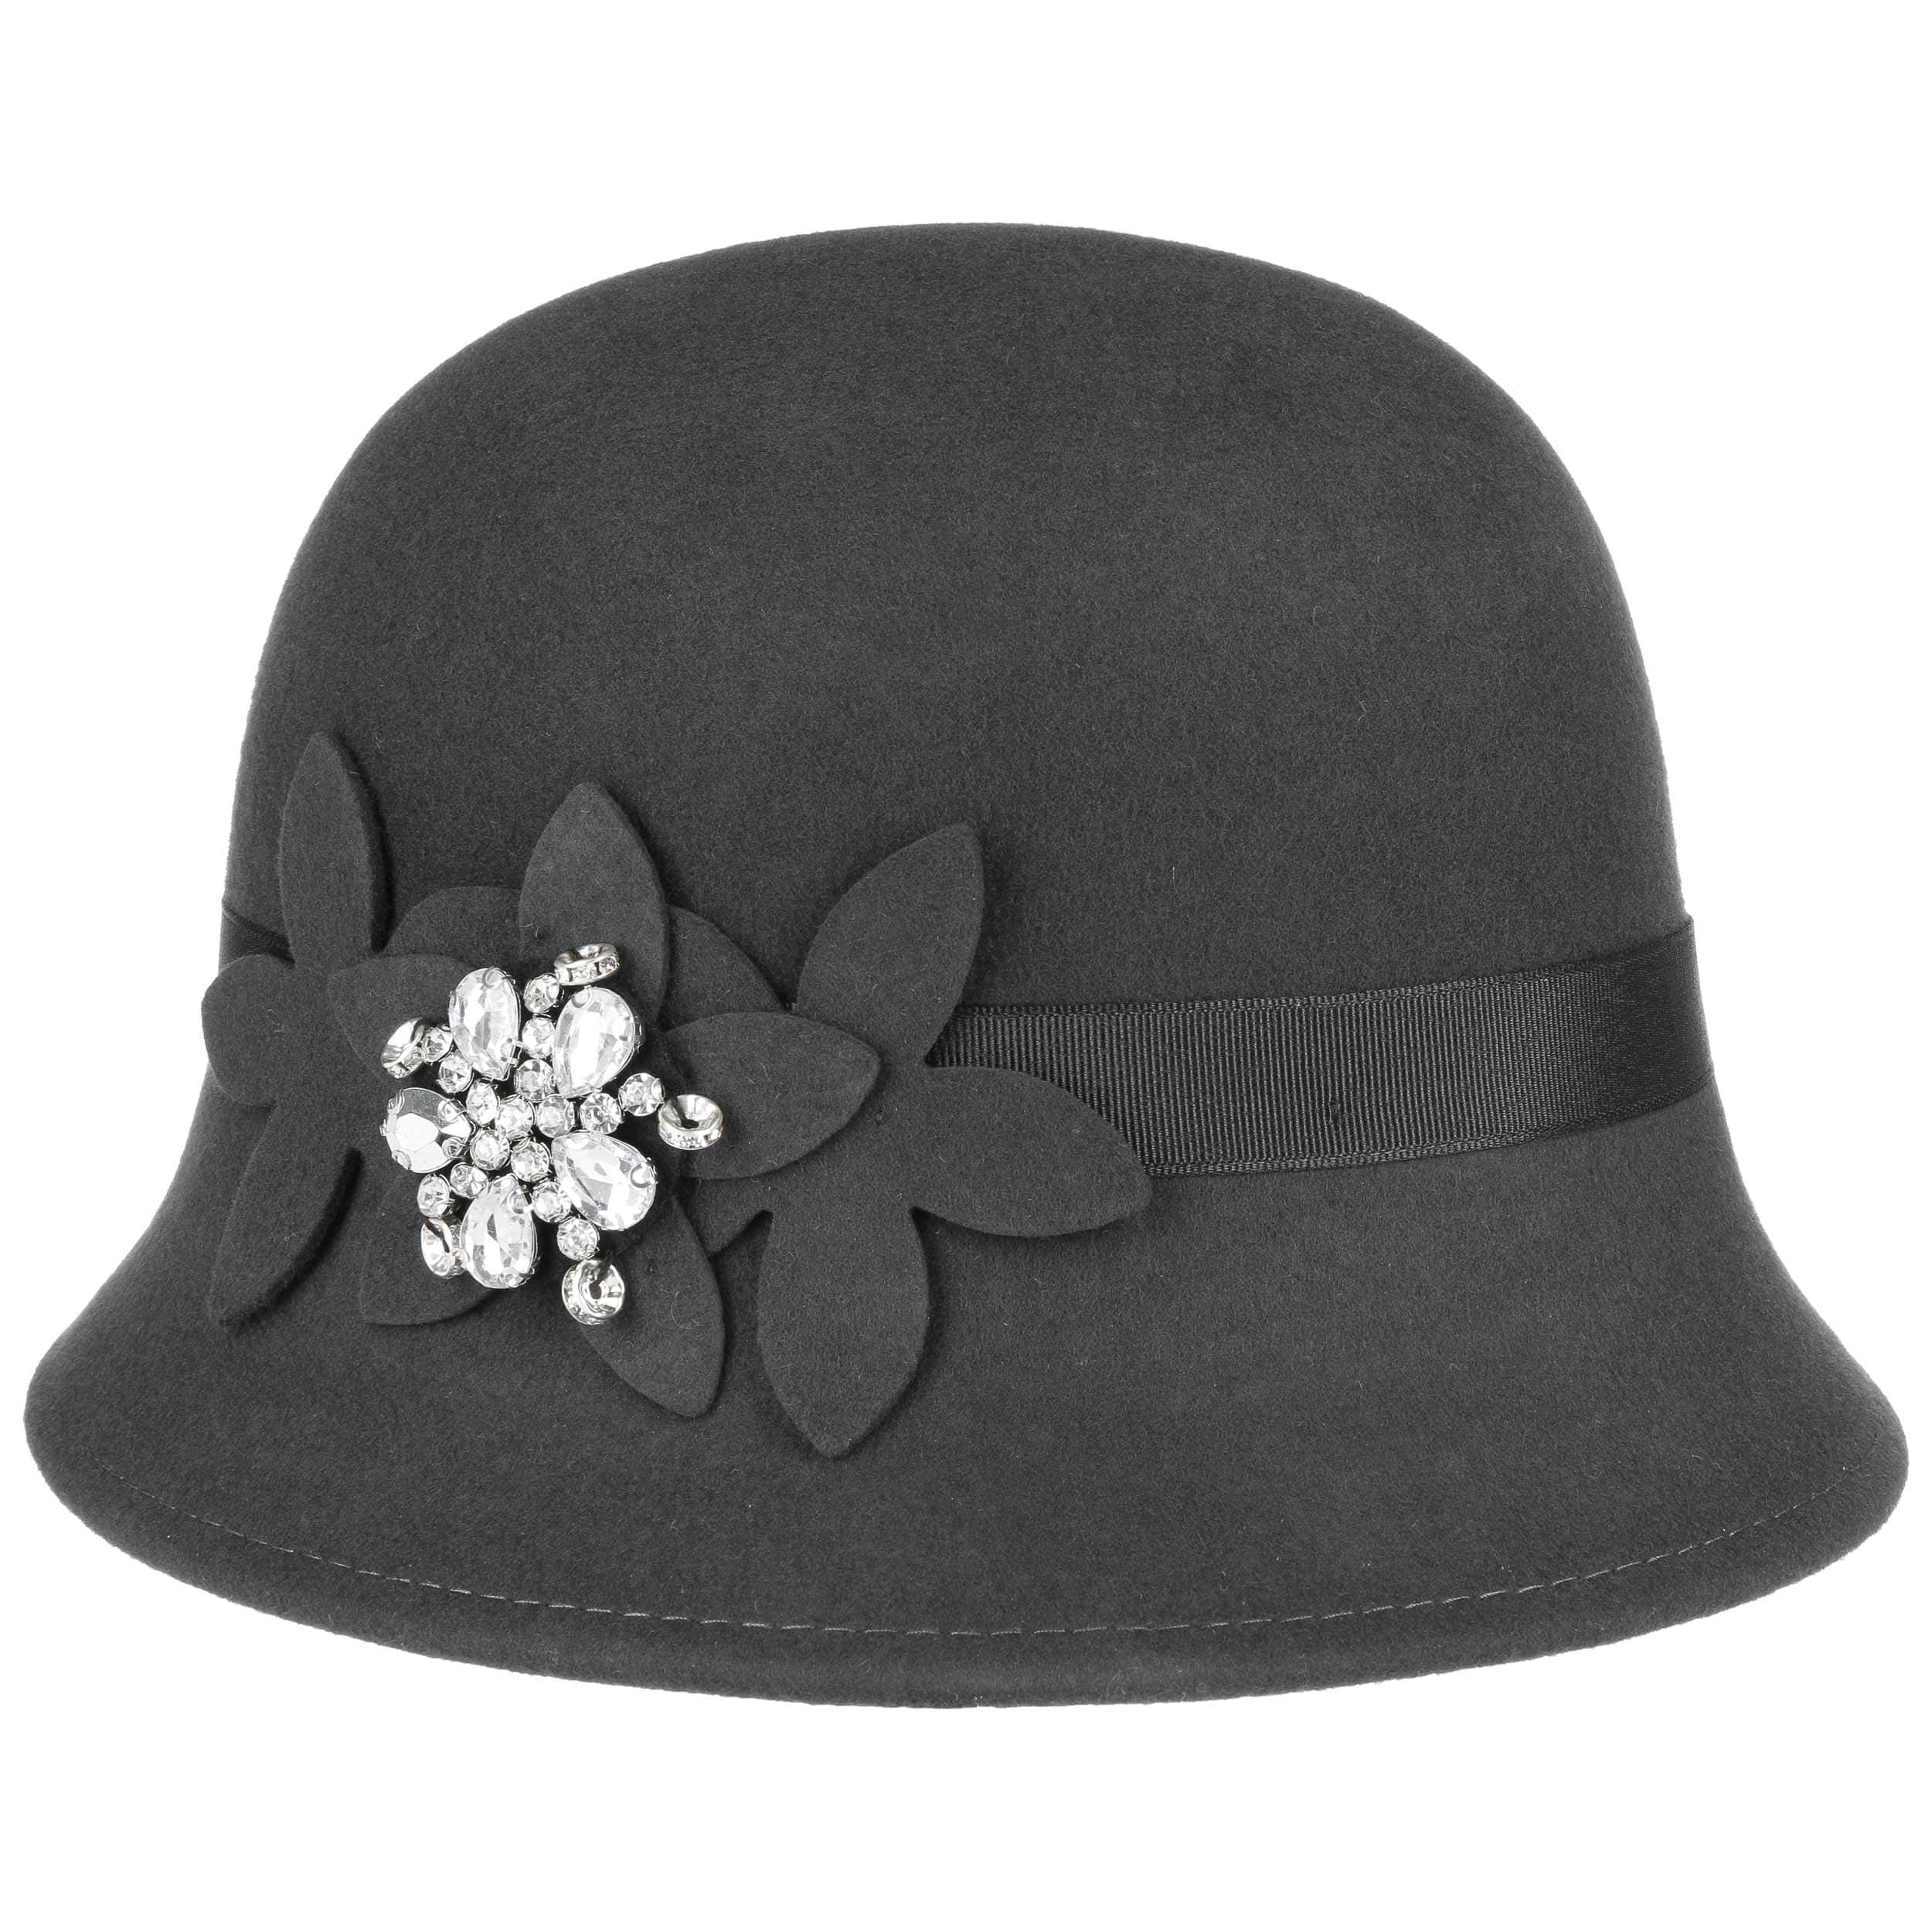 ... azul 4 · Sombrero Cloché con Flores y Estrás by Lipodo - gris oscuro 4 cb0d410df3b